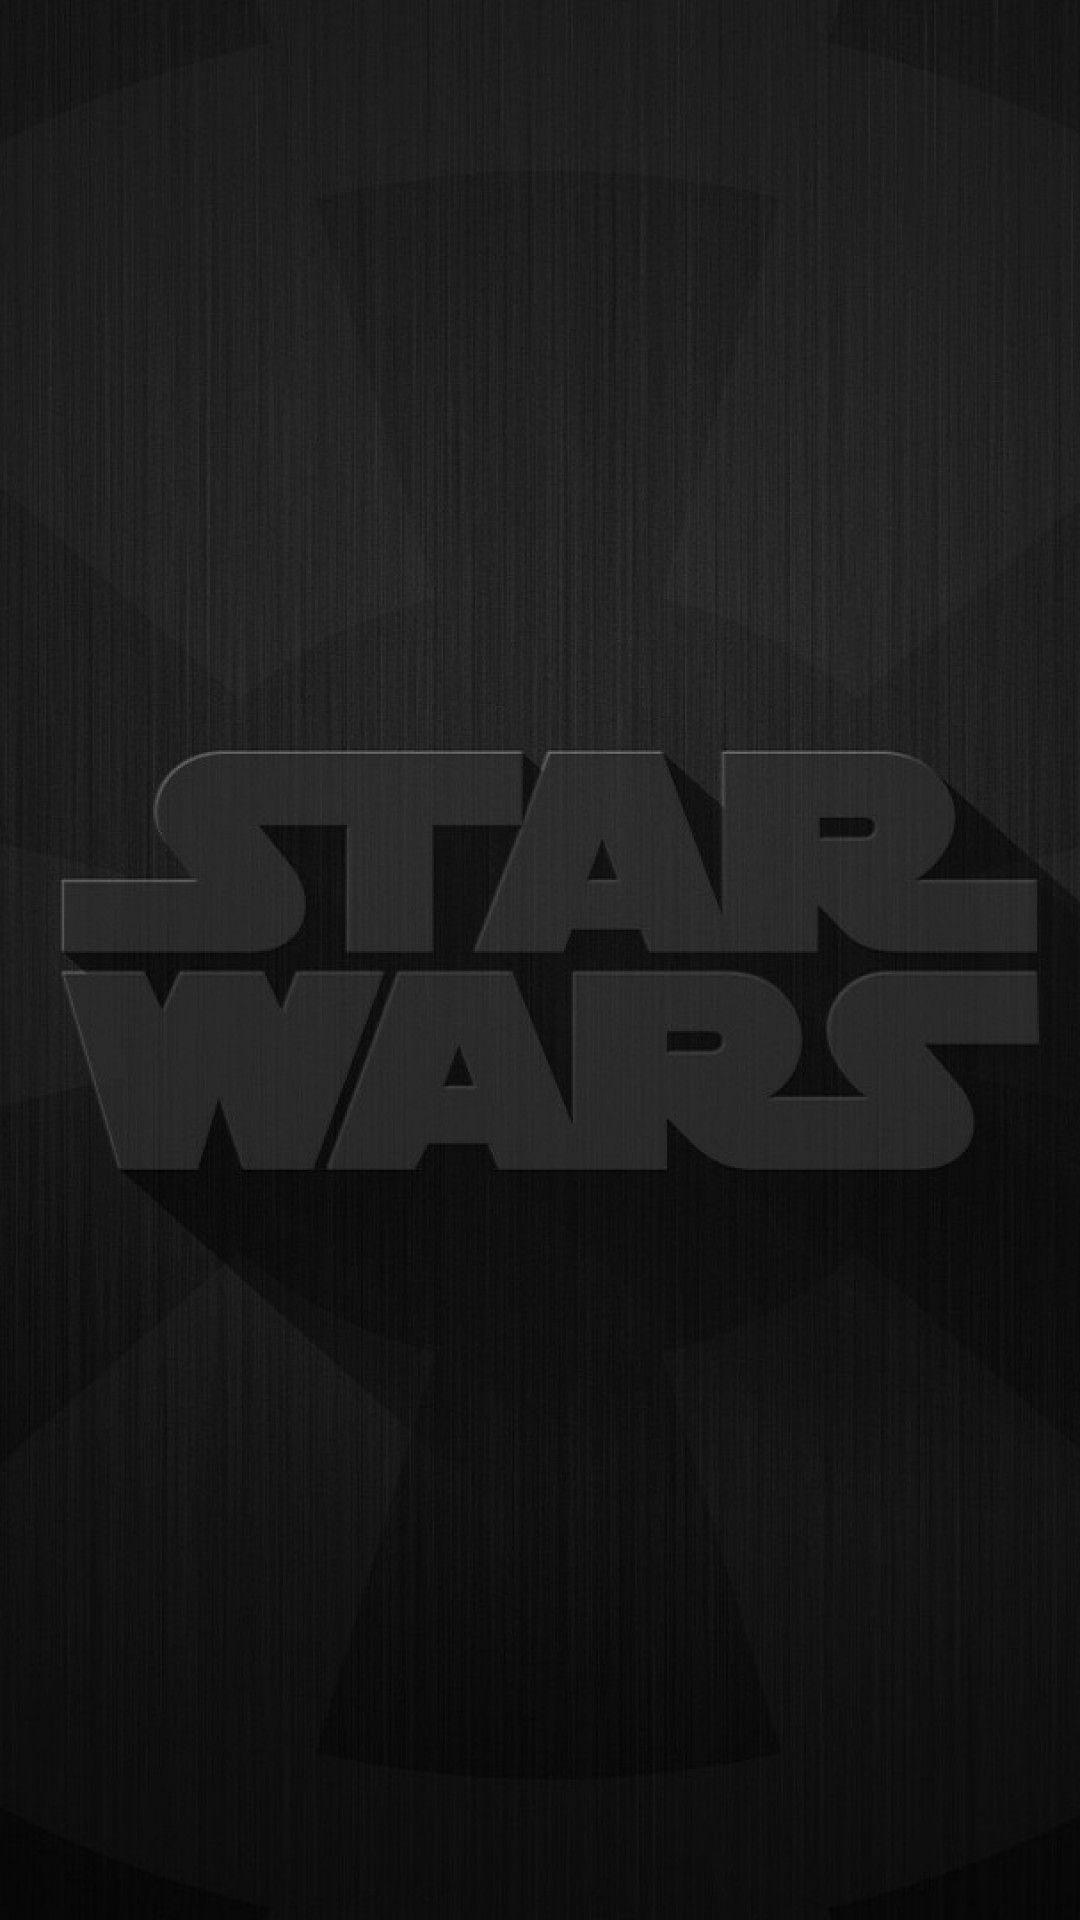 Star Wars Umbra Operative Clone Wallpaper in 2020 Star